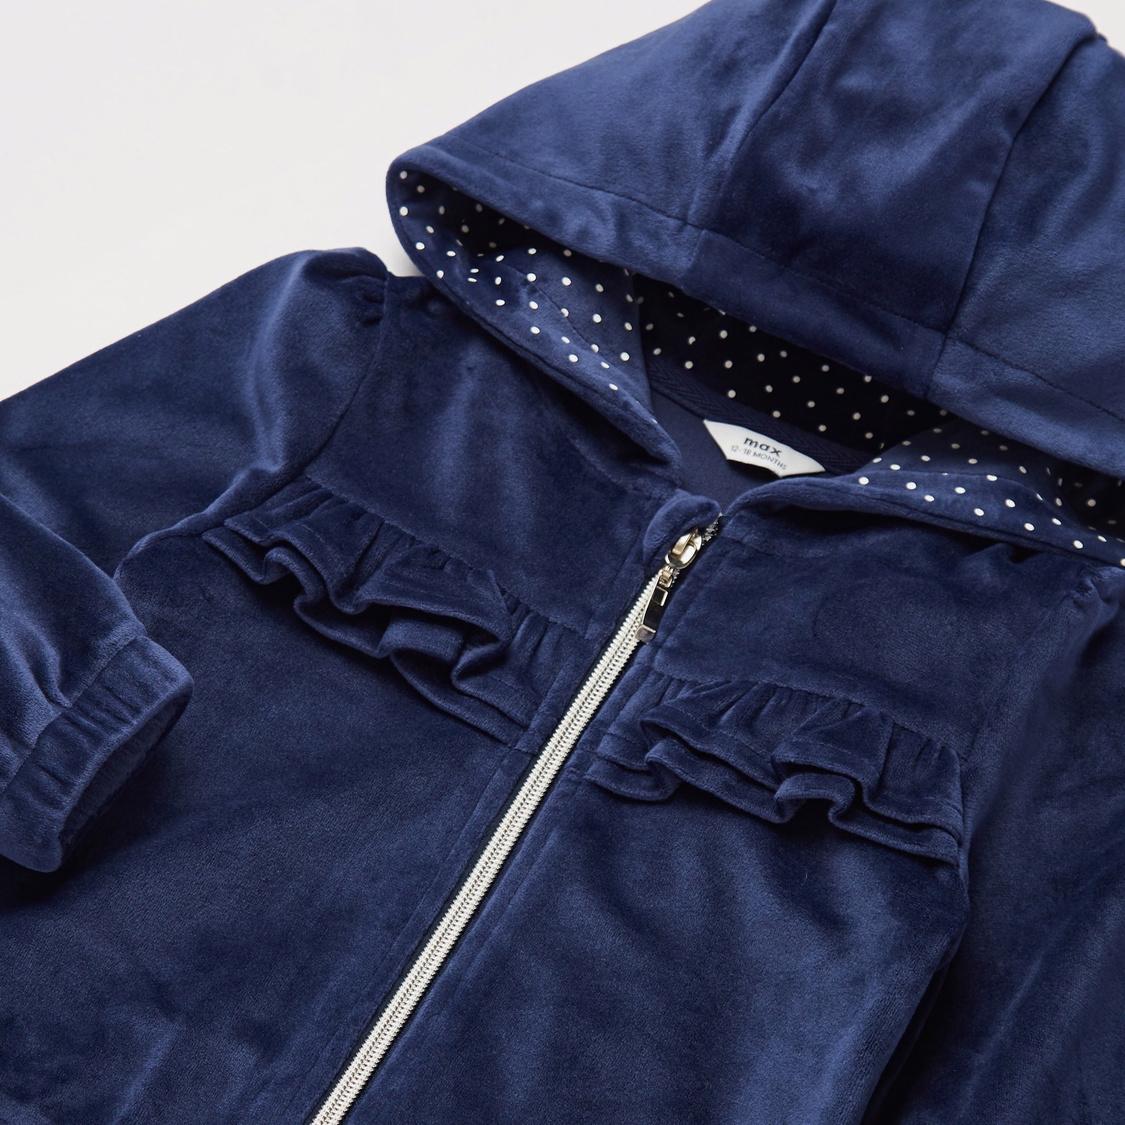 Frill Detail Long Sleeves Jacket with Full Length Jog Pants